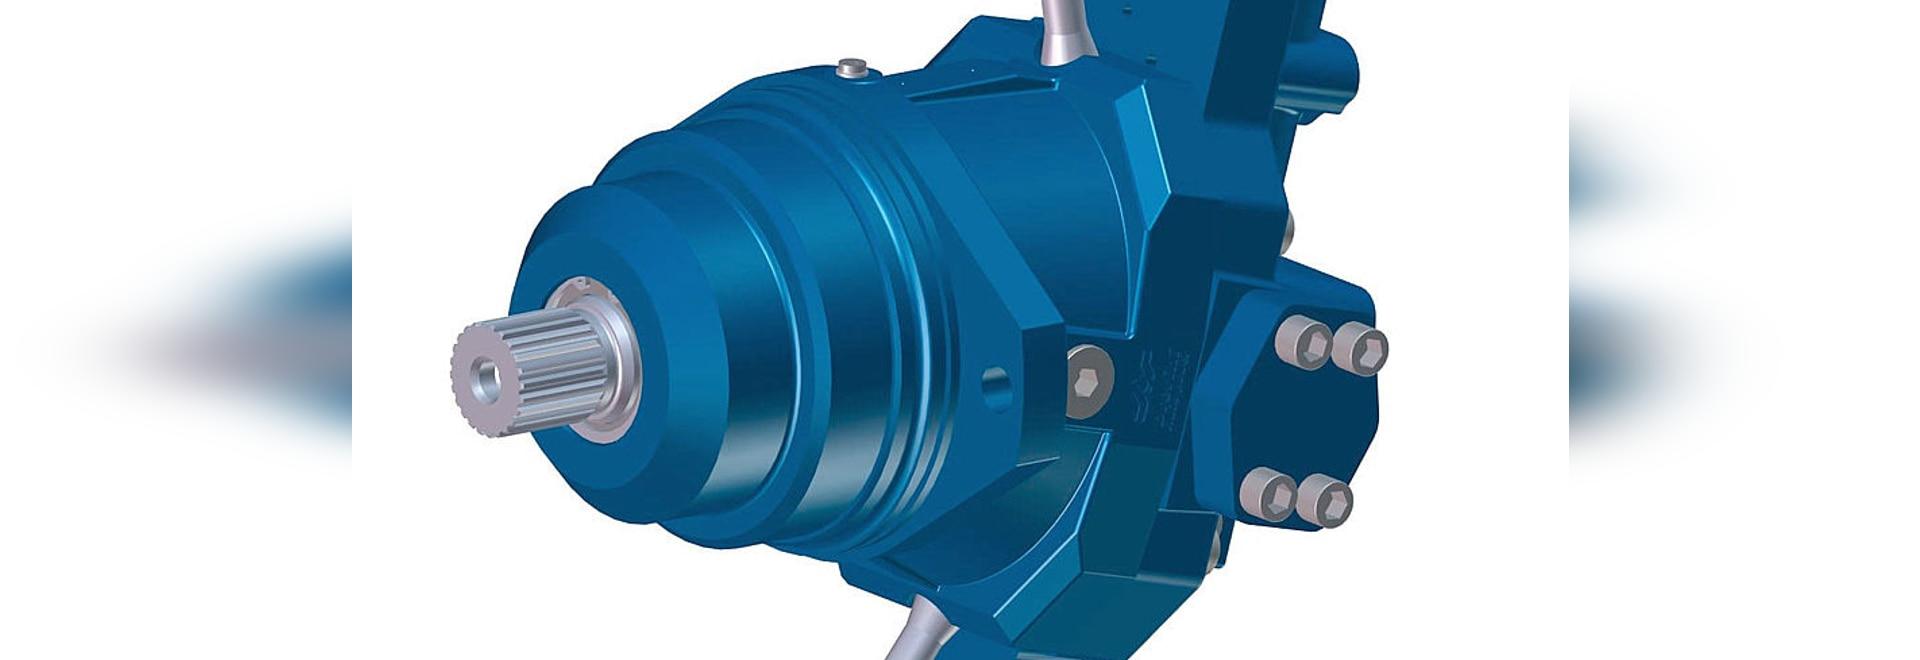 NEW: hydraulic motor by Brevini Power Transmission - Brevini